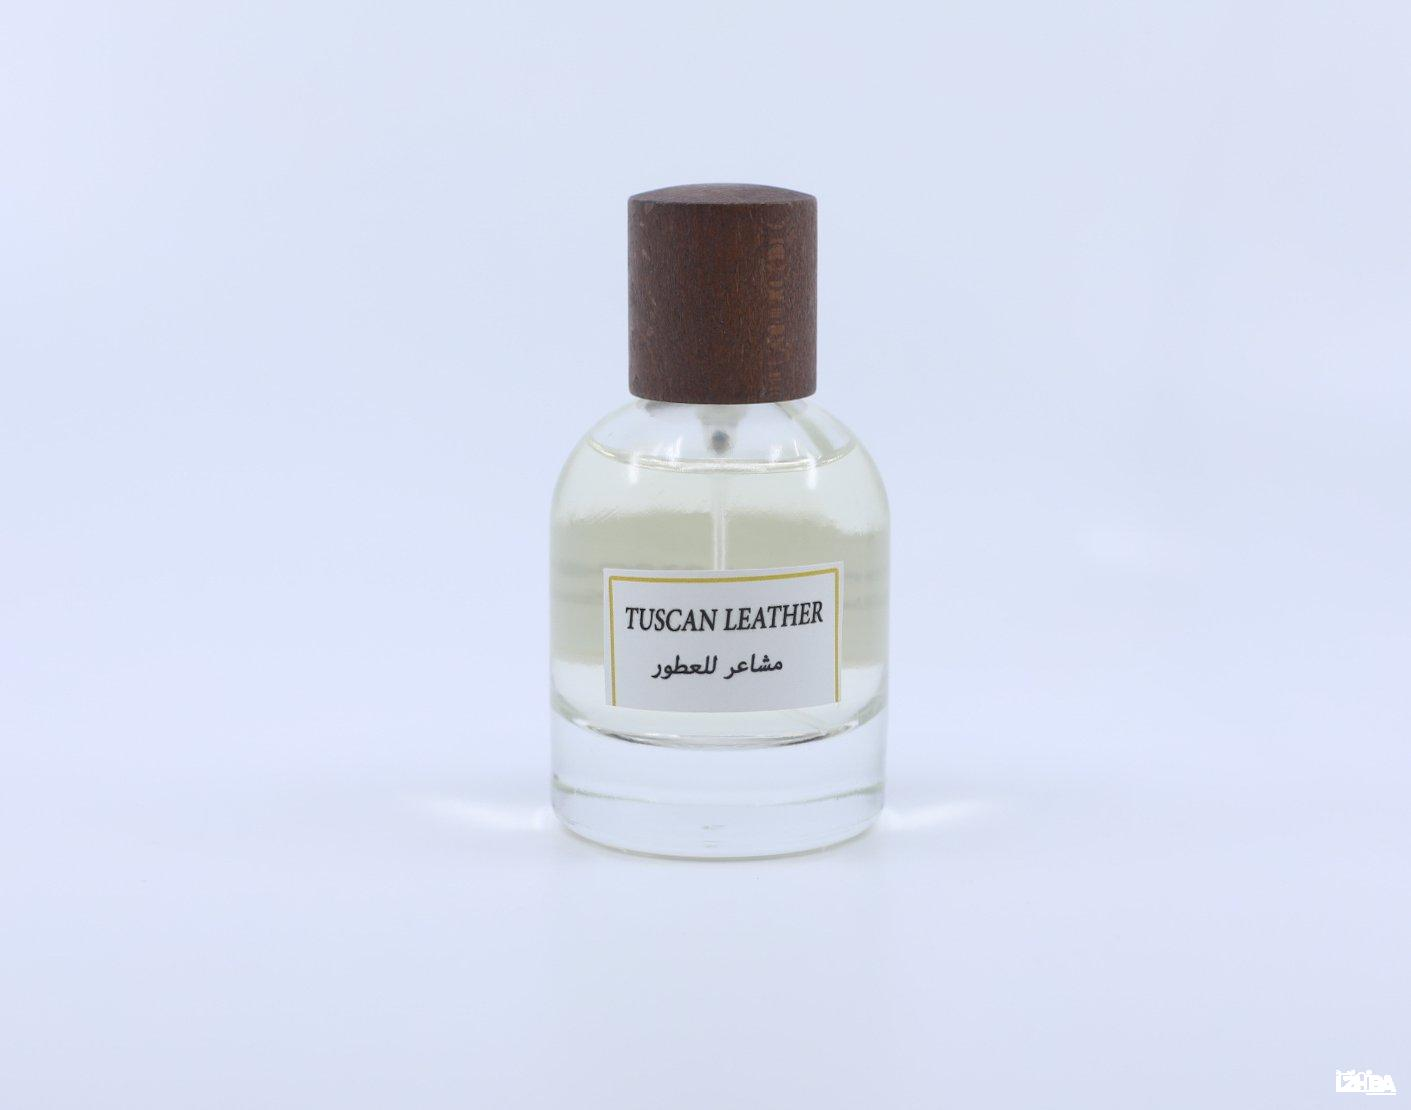 Tuscan Leather Perfume